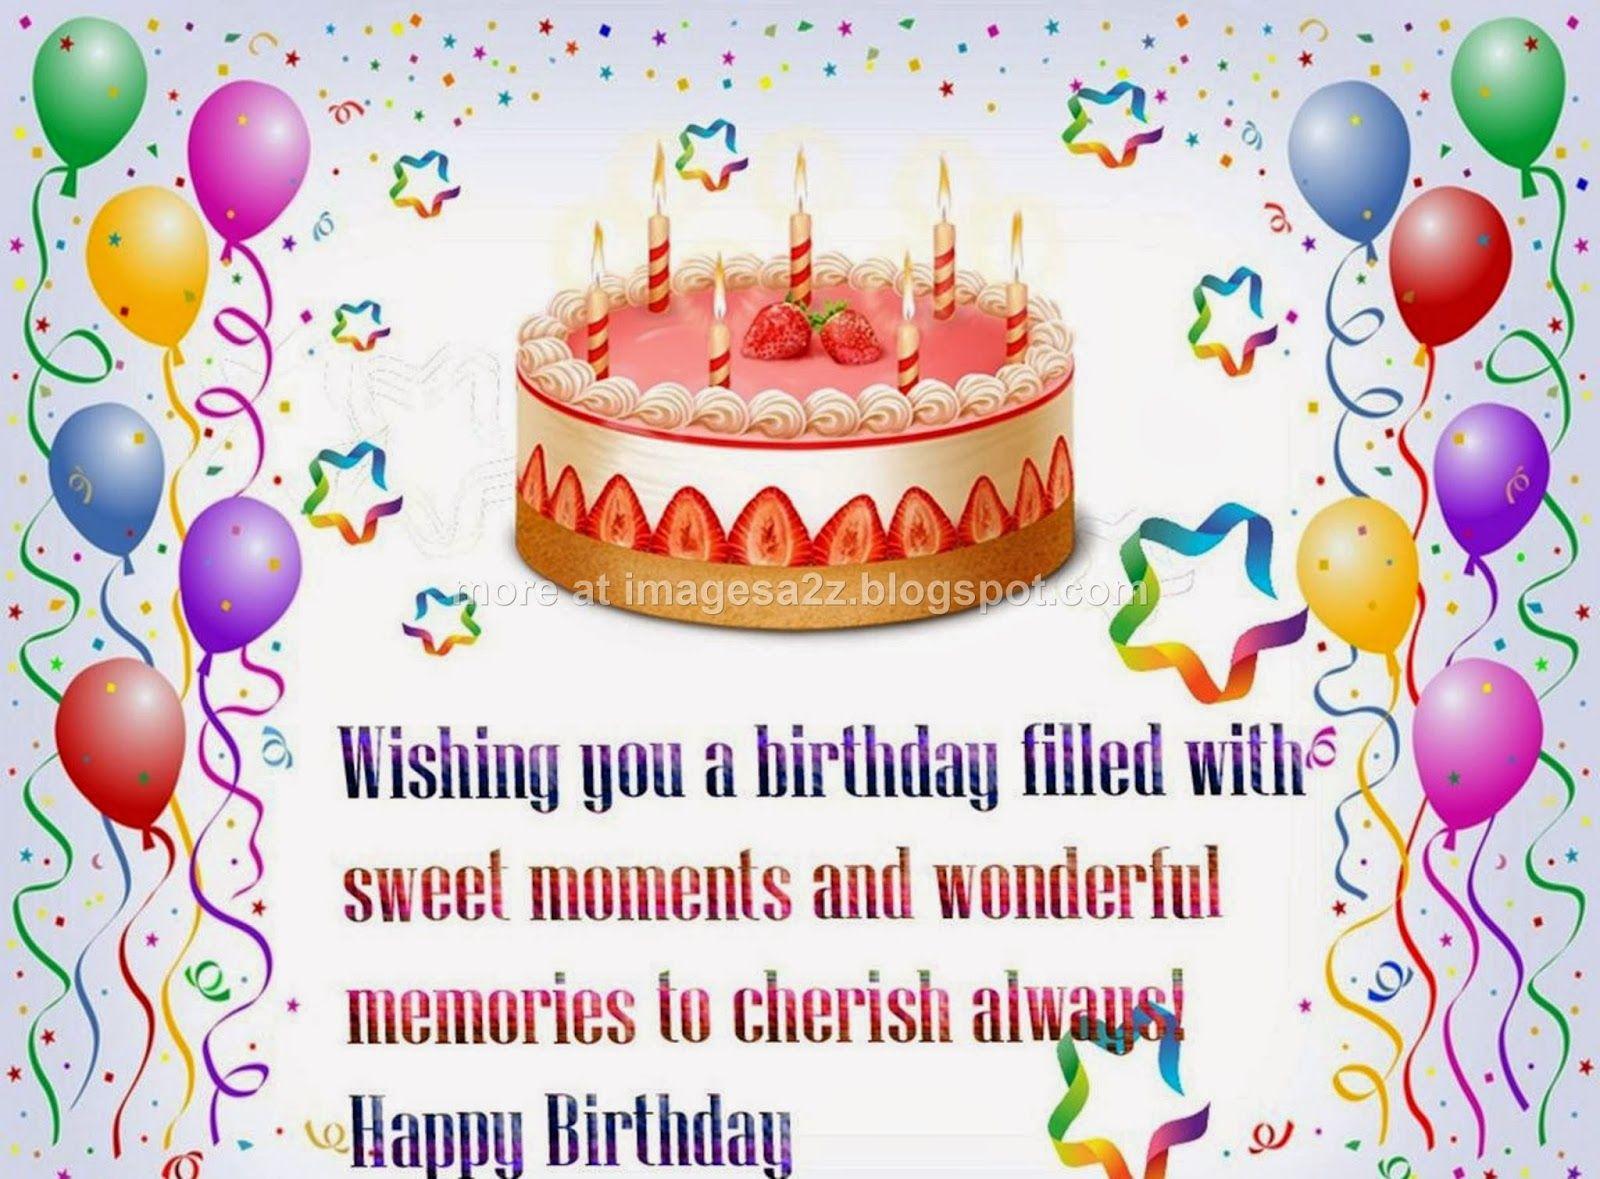 Happy Birthday Wish Quote httpwwwhappybirthdaywishesonlinecom